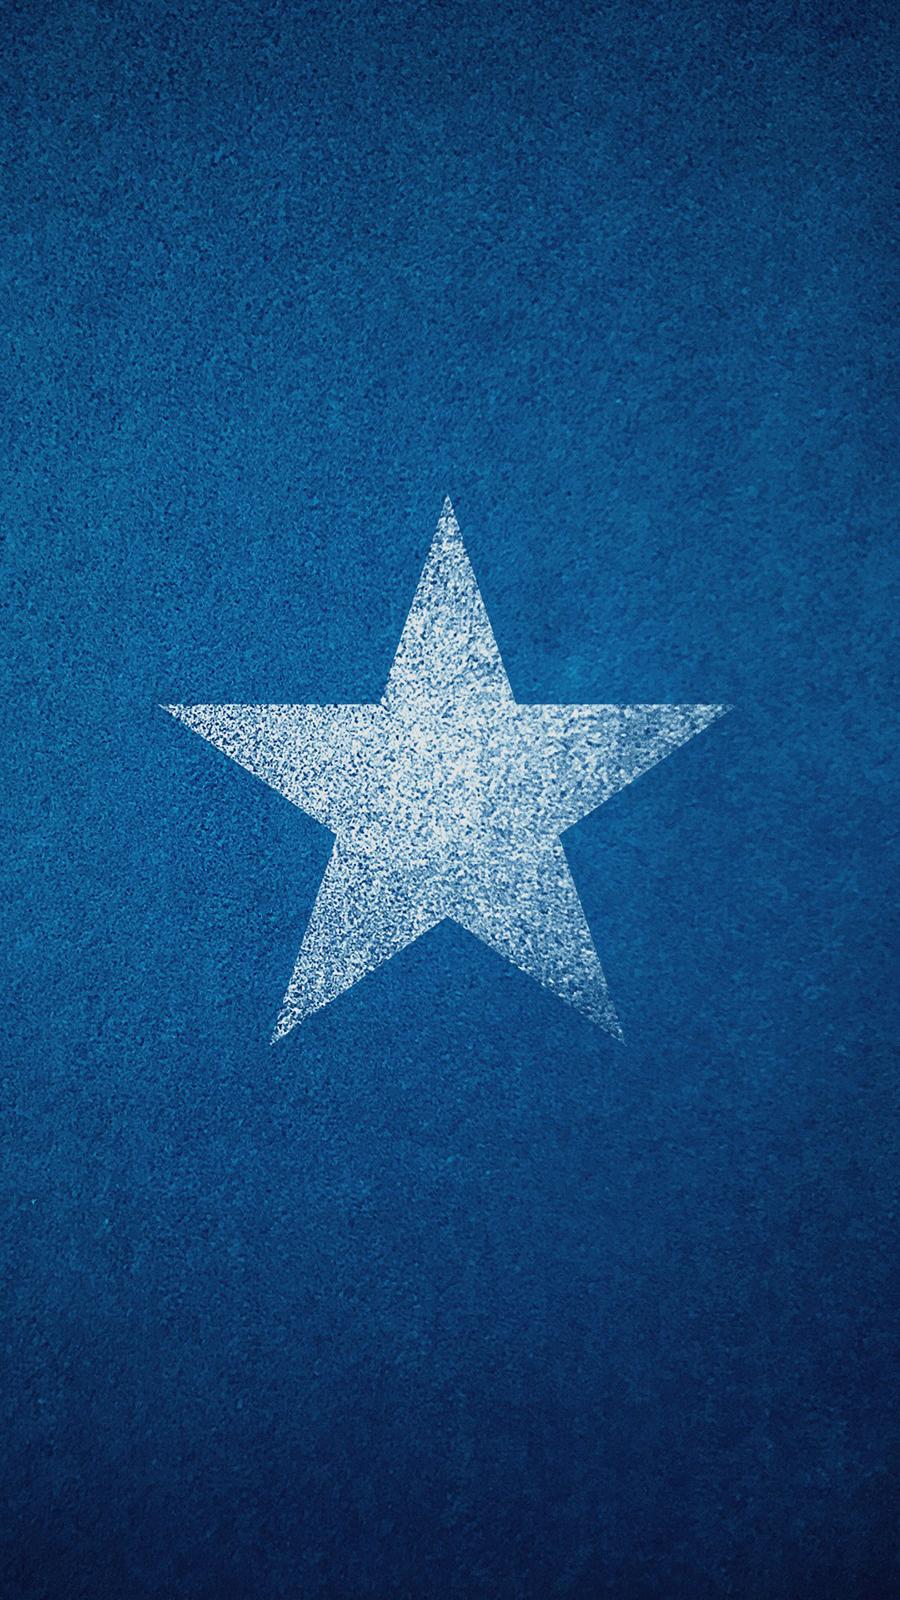 Star Logo Wallpapers Free Download